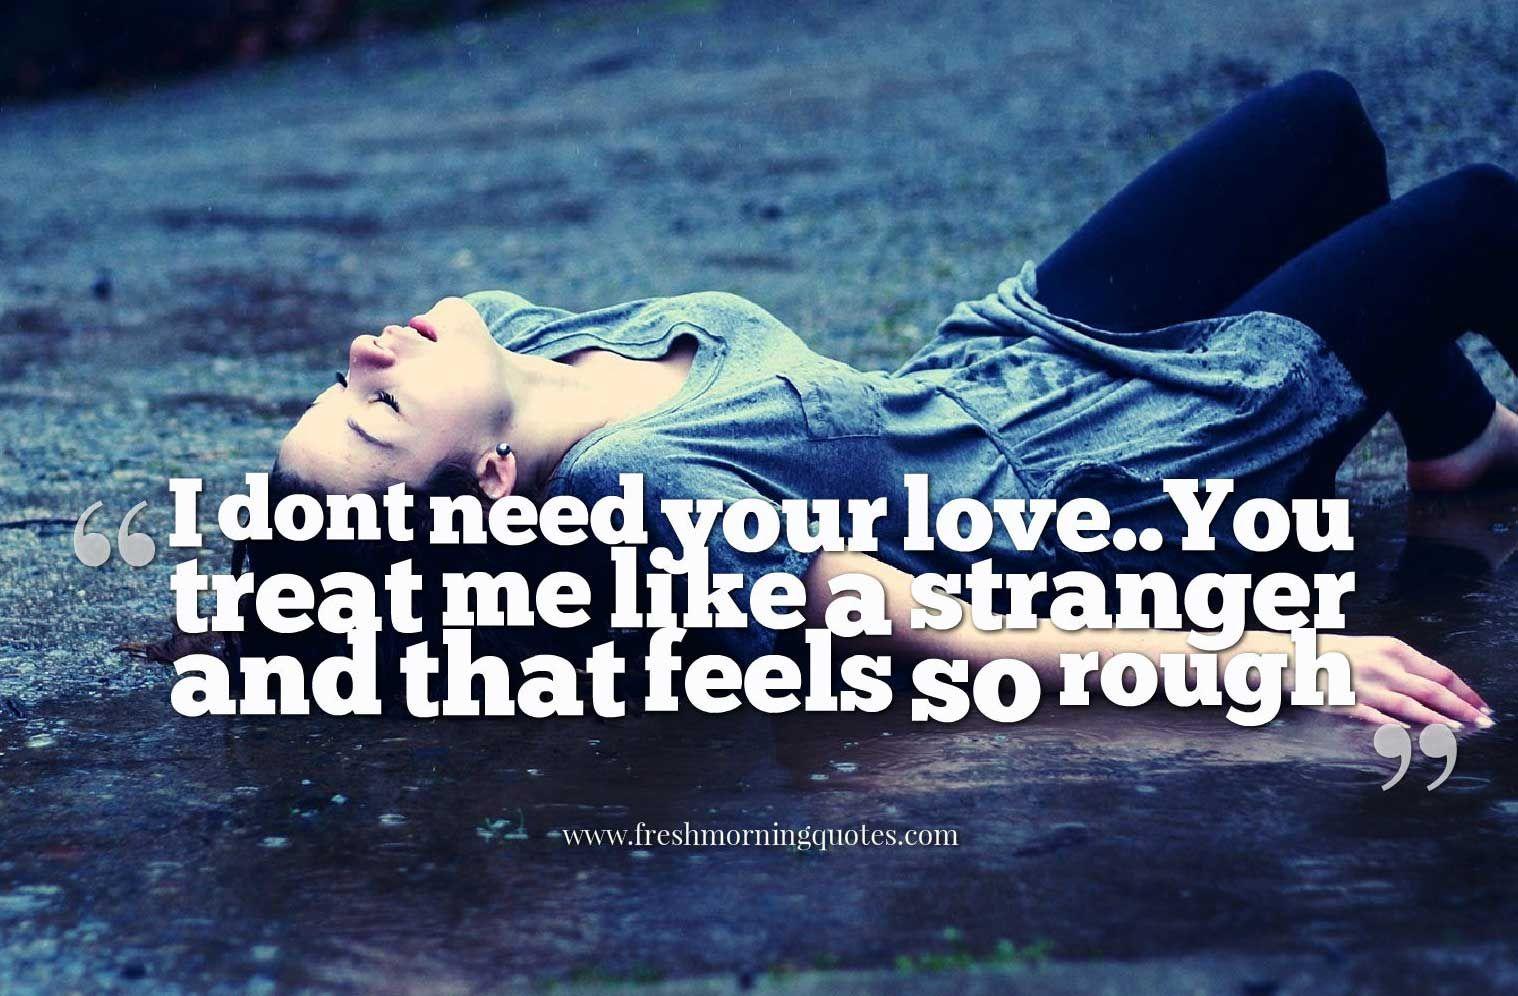 Funny Meme For Broken Heart : Broken love promise quotes promise quotes pinterest heart